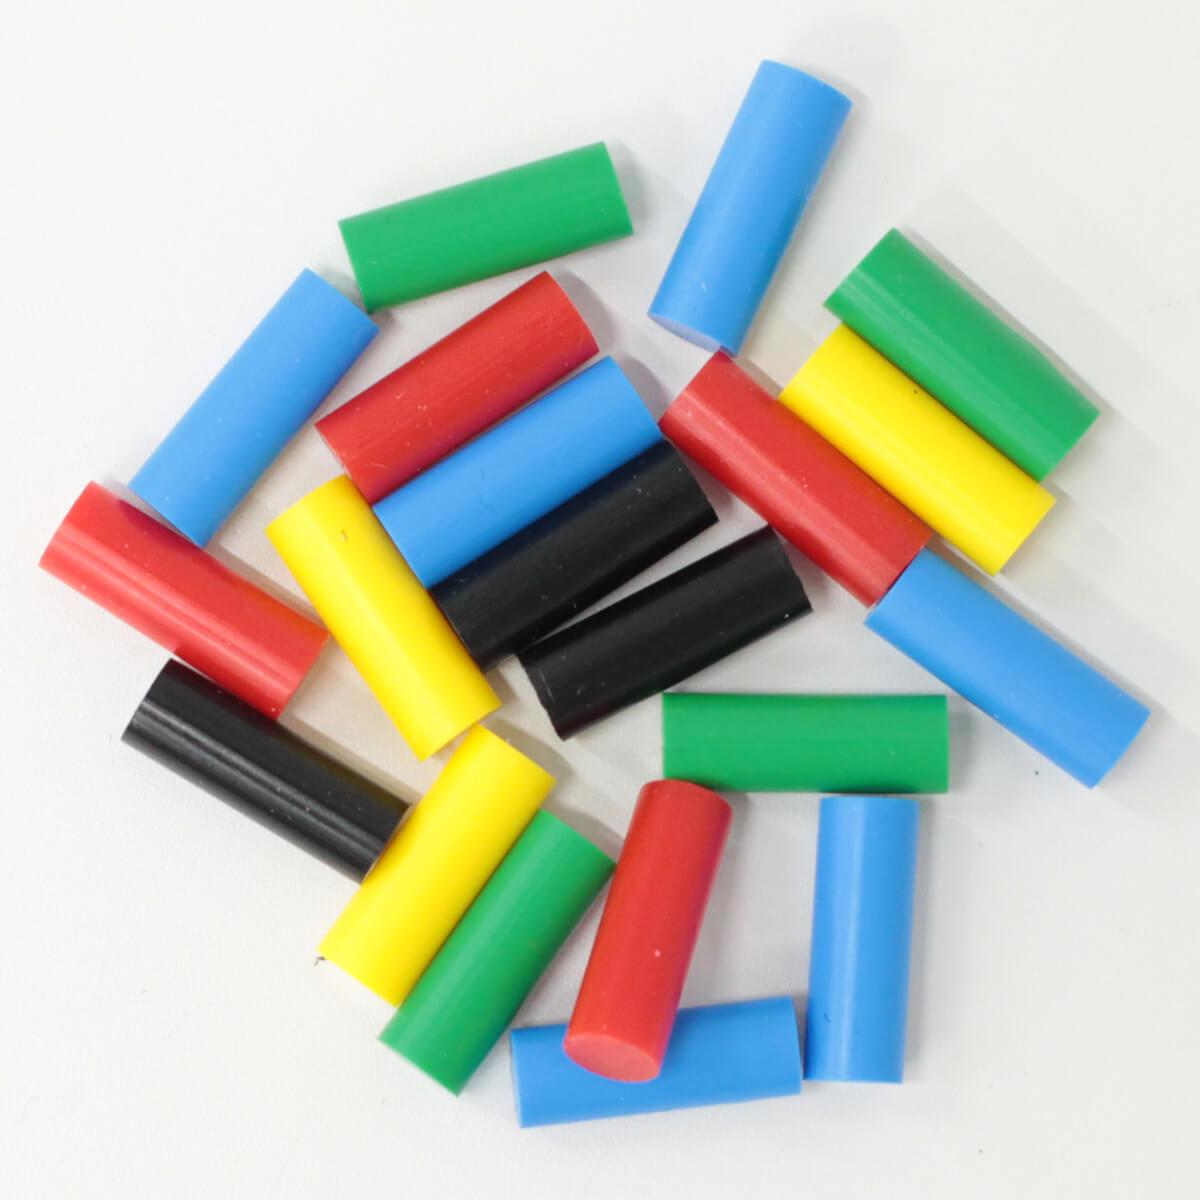 GLUEY専用グルースティック 赤、黄、青、黒、緑 5色×各14本入 ボッシュ